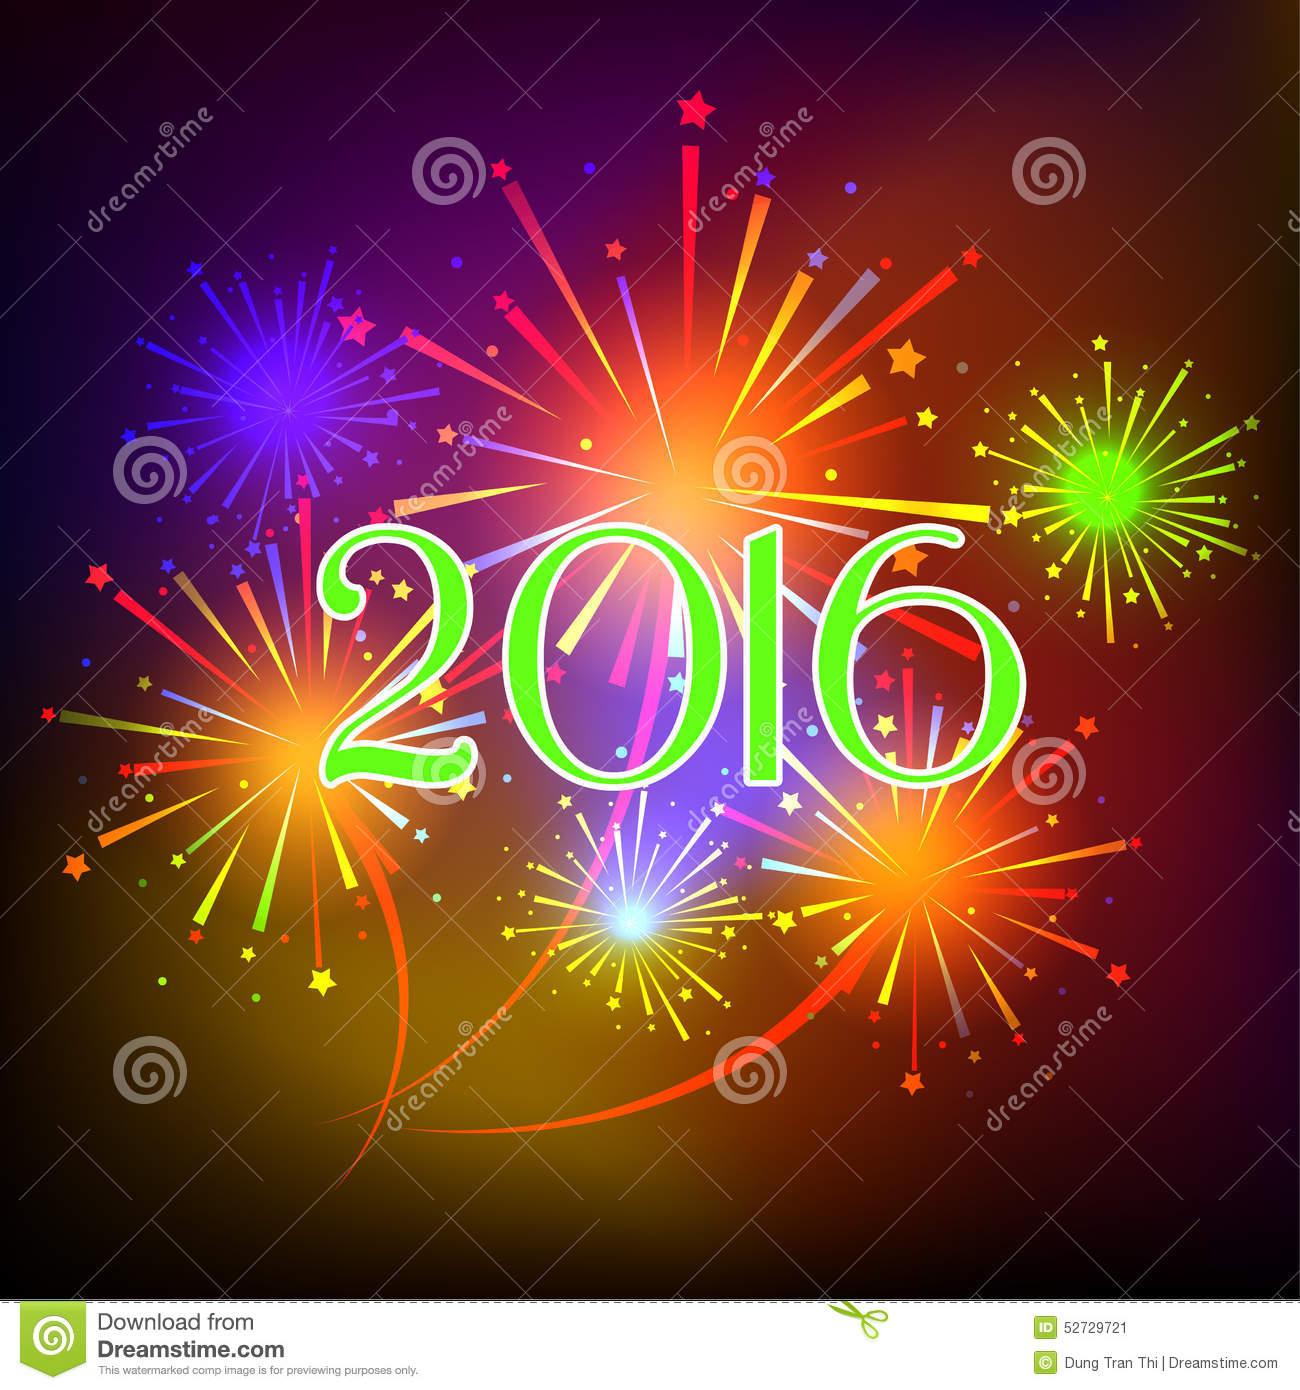 Happy New Year 2016 Image HD Wallpaper 17356 Wallpaper computer 1300x1390